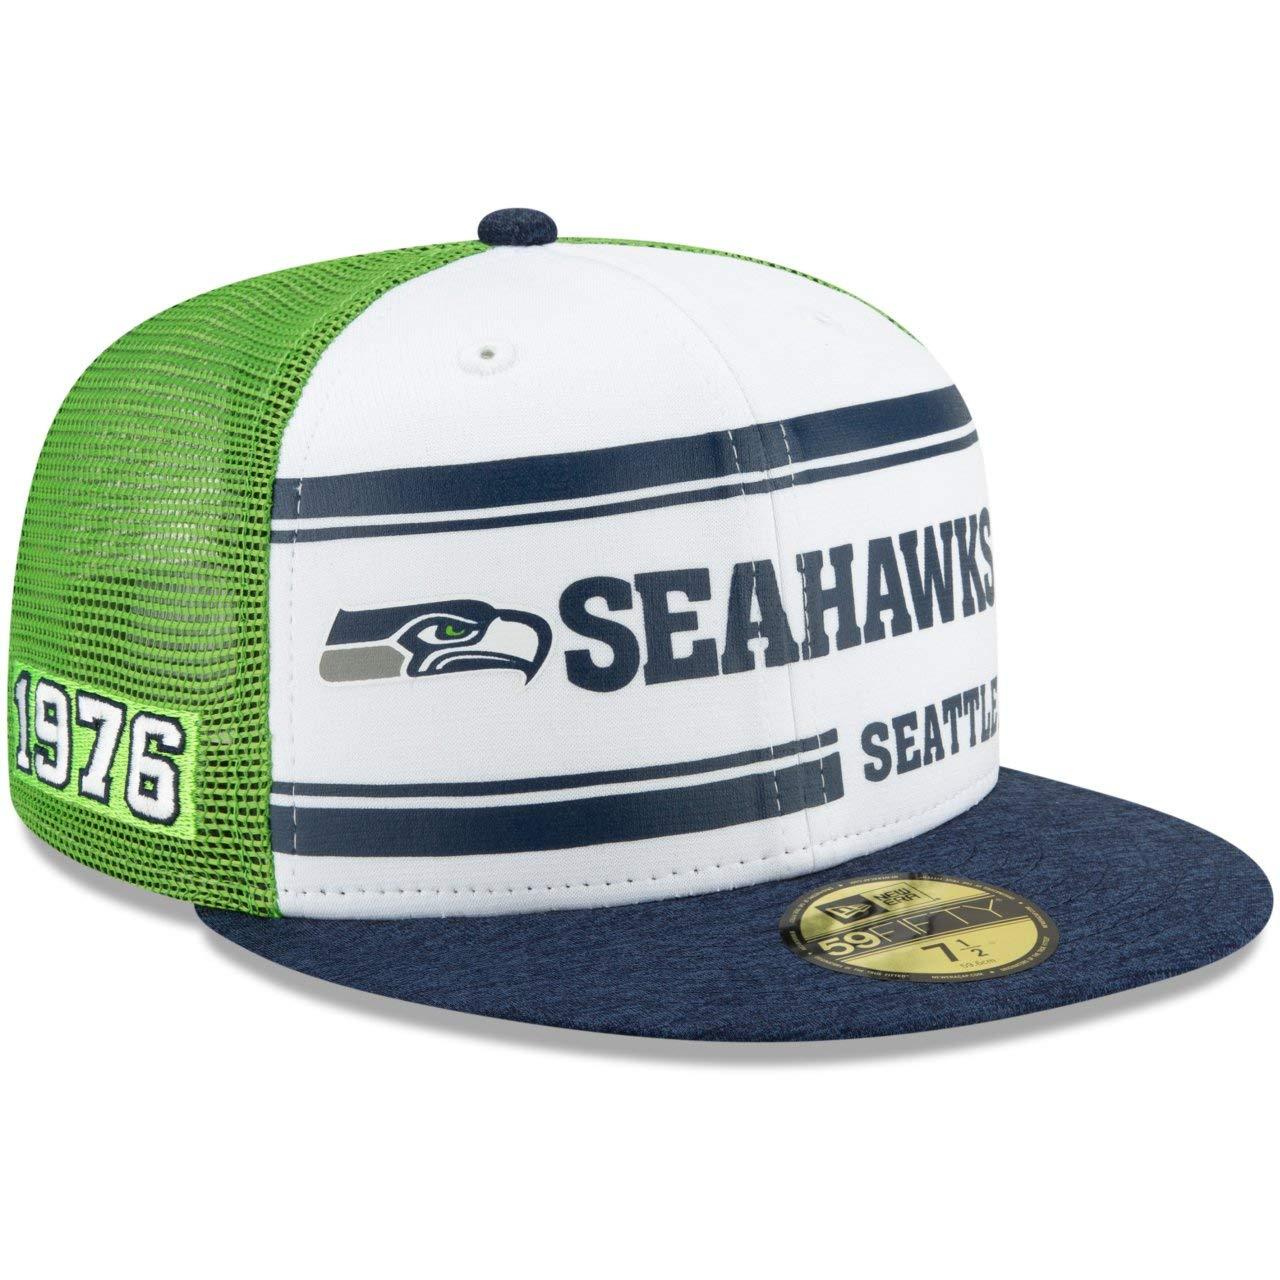 Sideline 1970s Home Seattle Seahawks New Era 59Fifty Cap